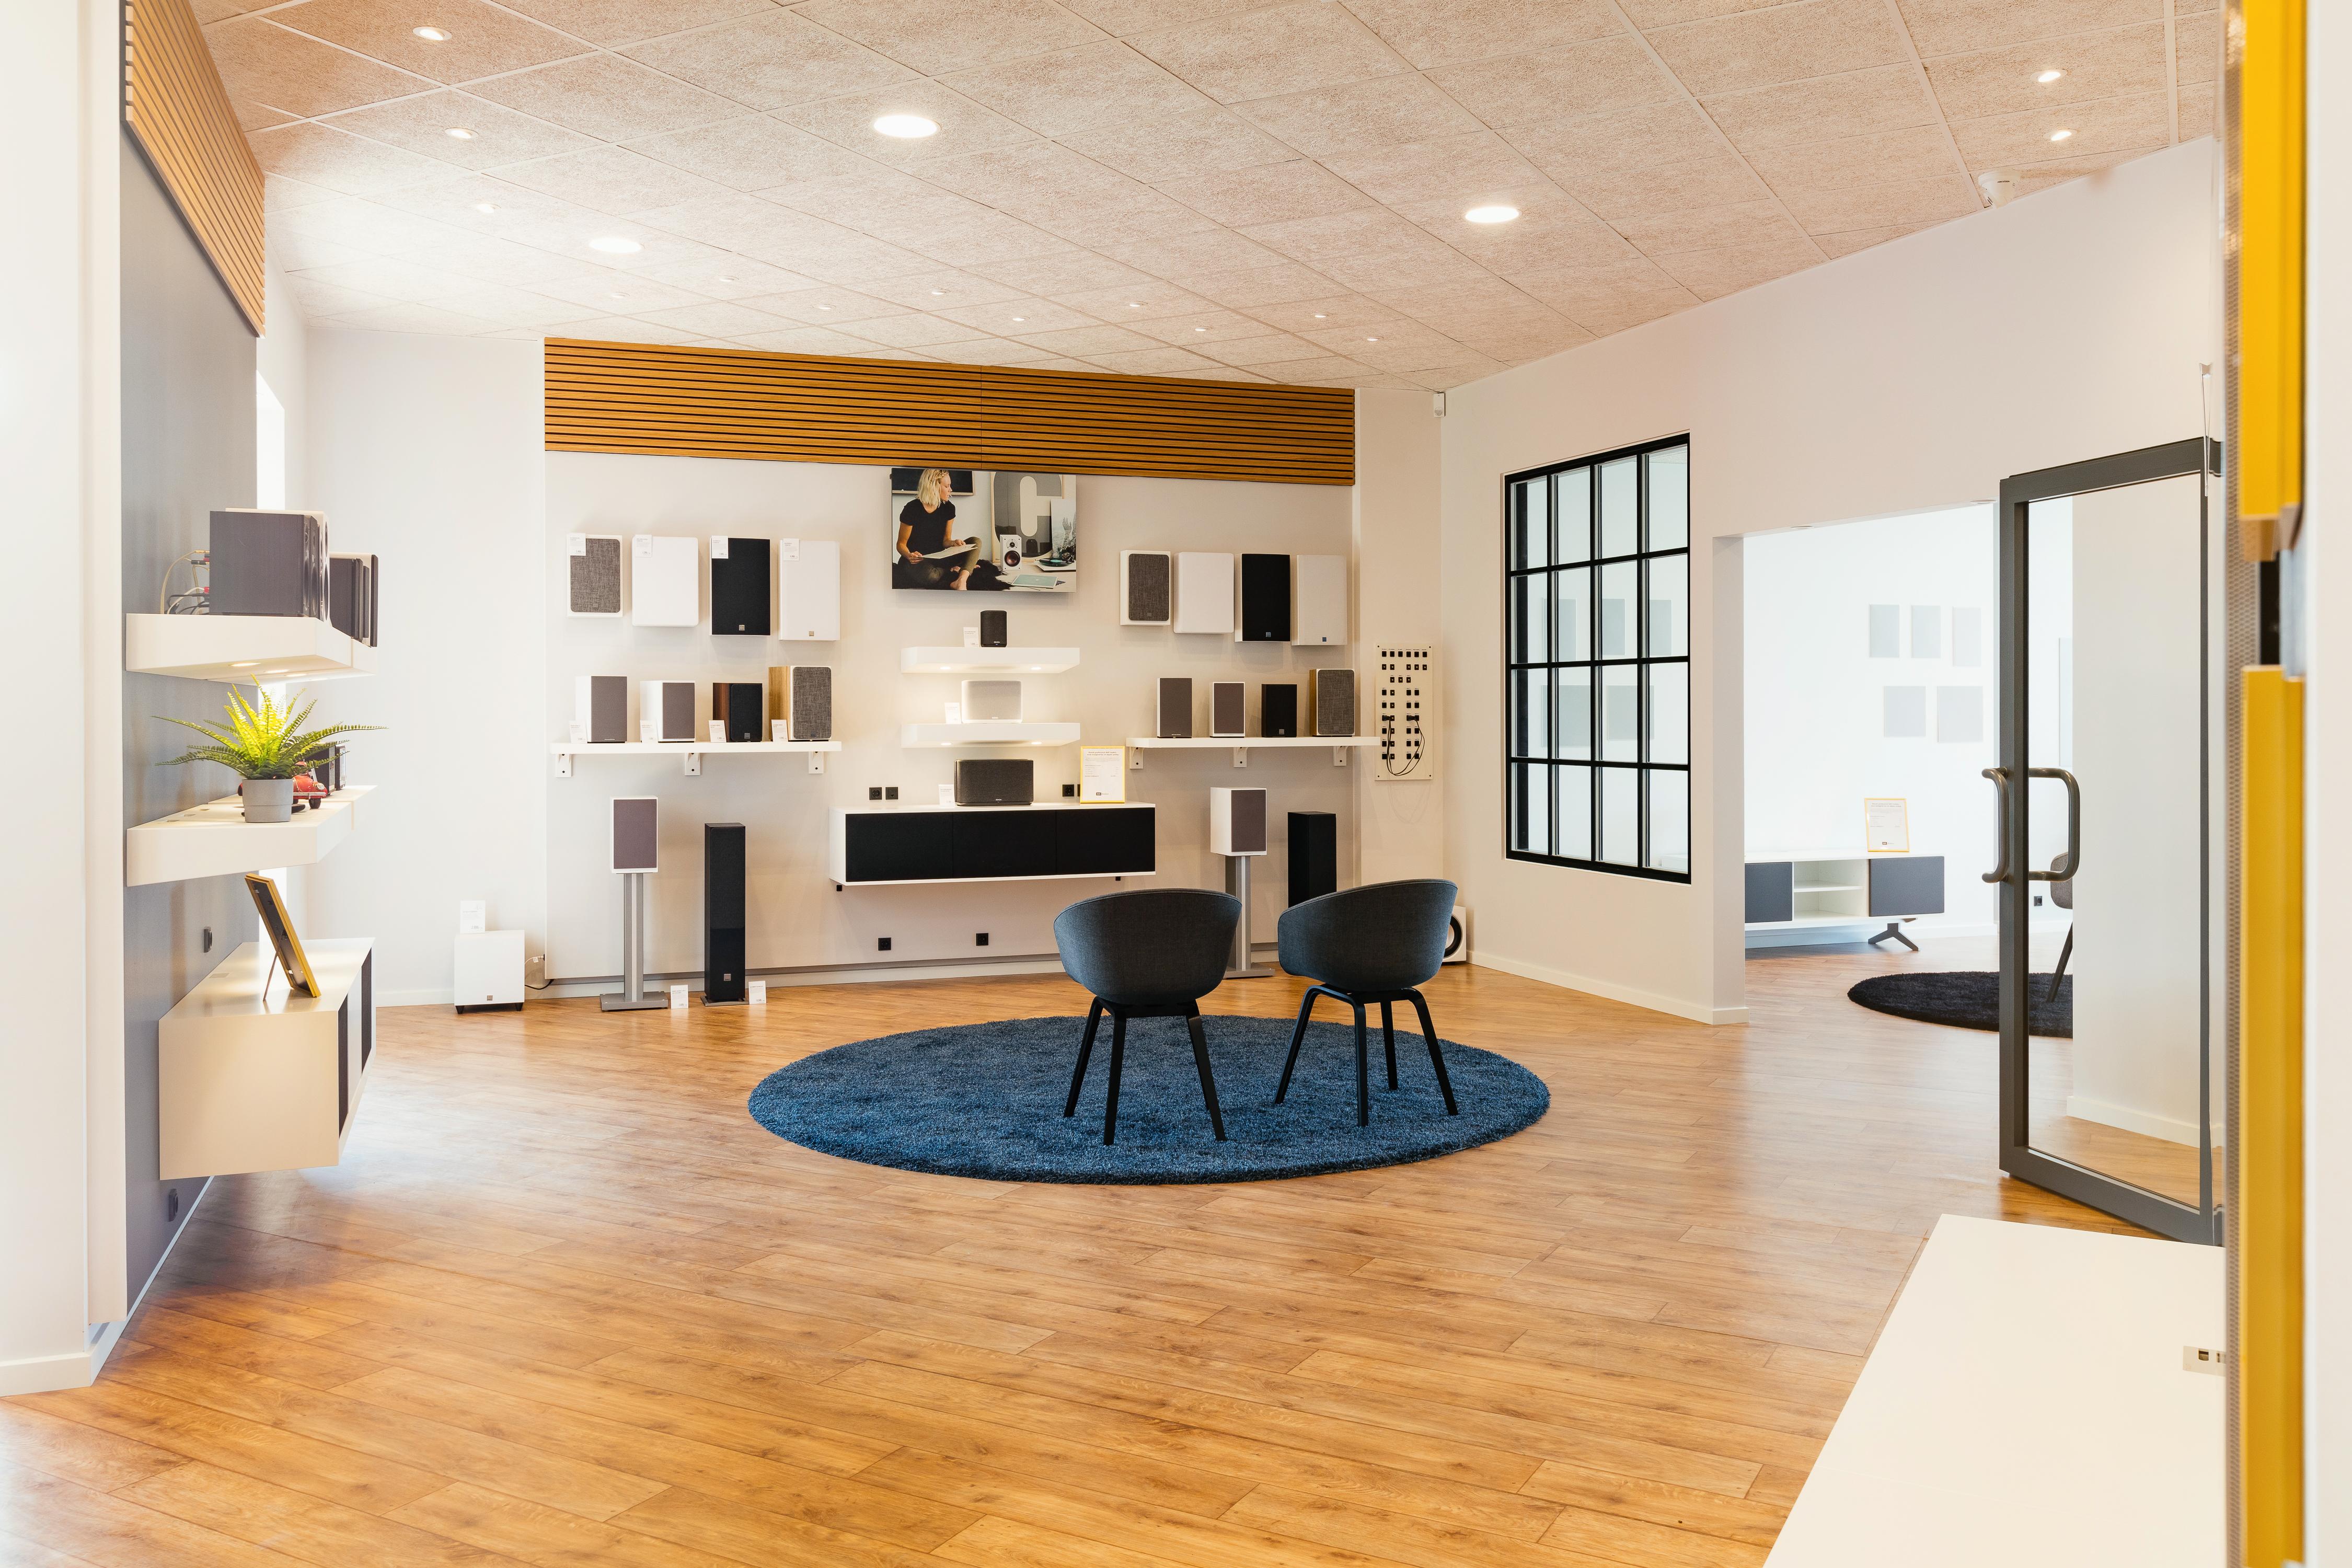 Ny-butik_Aalborg (2).jpg